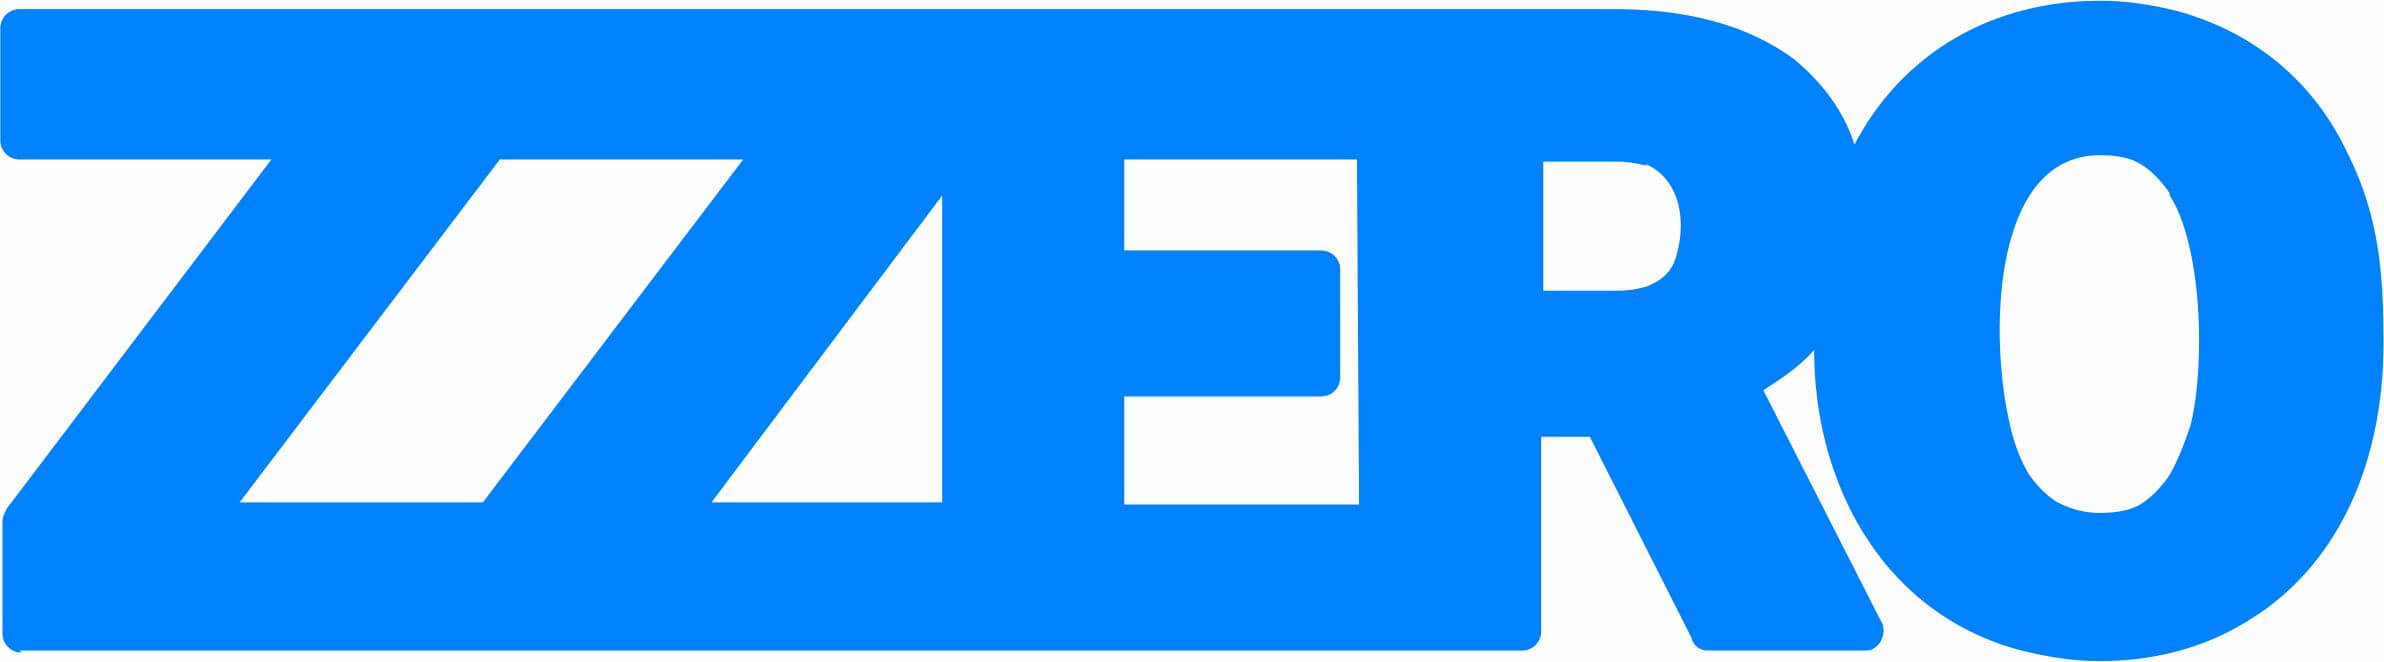 ZZERO 2021 – Digitale Gründermesse